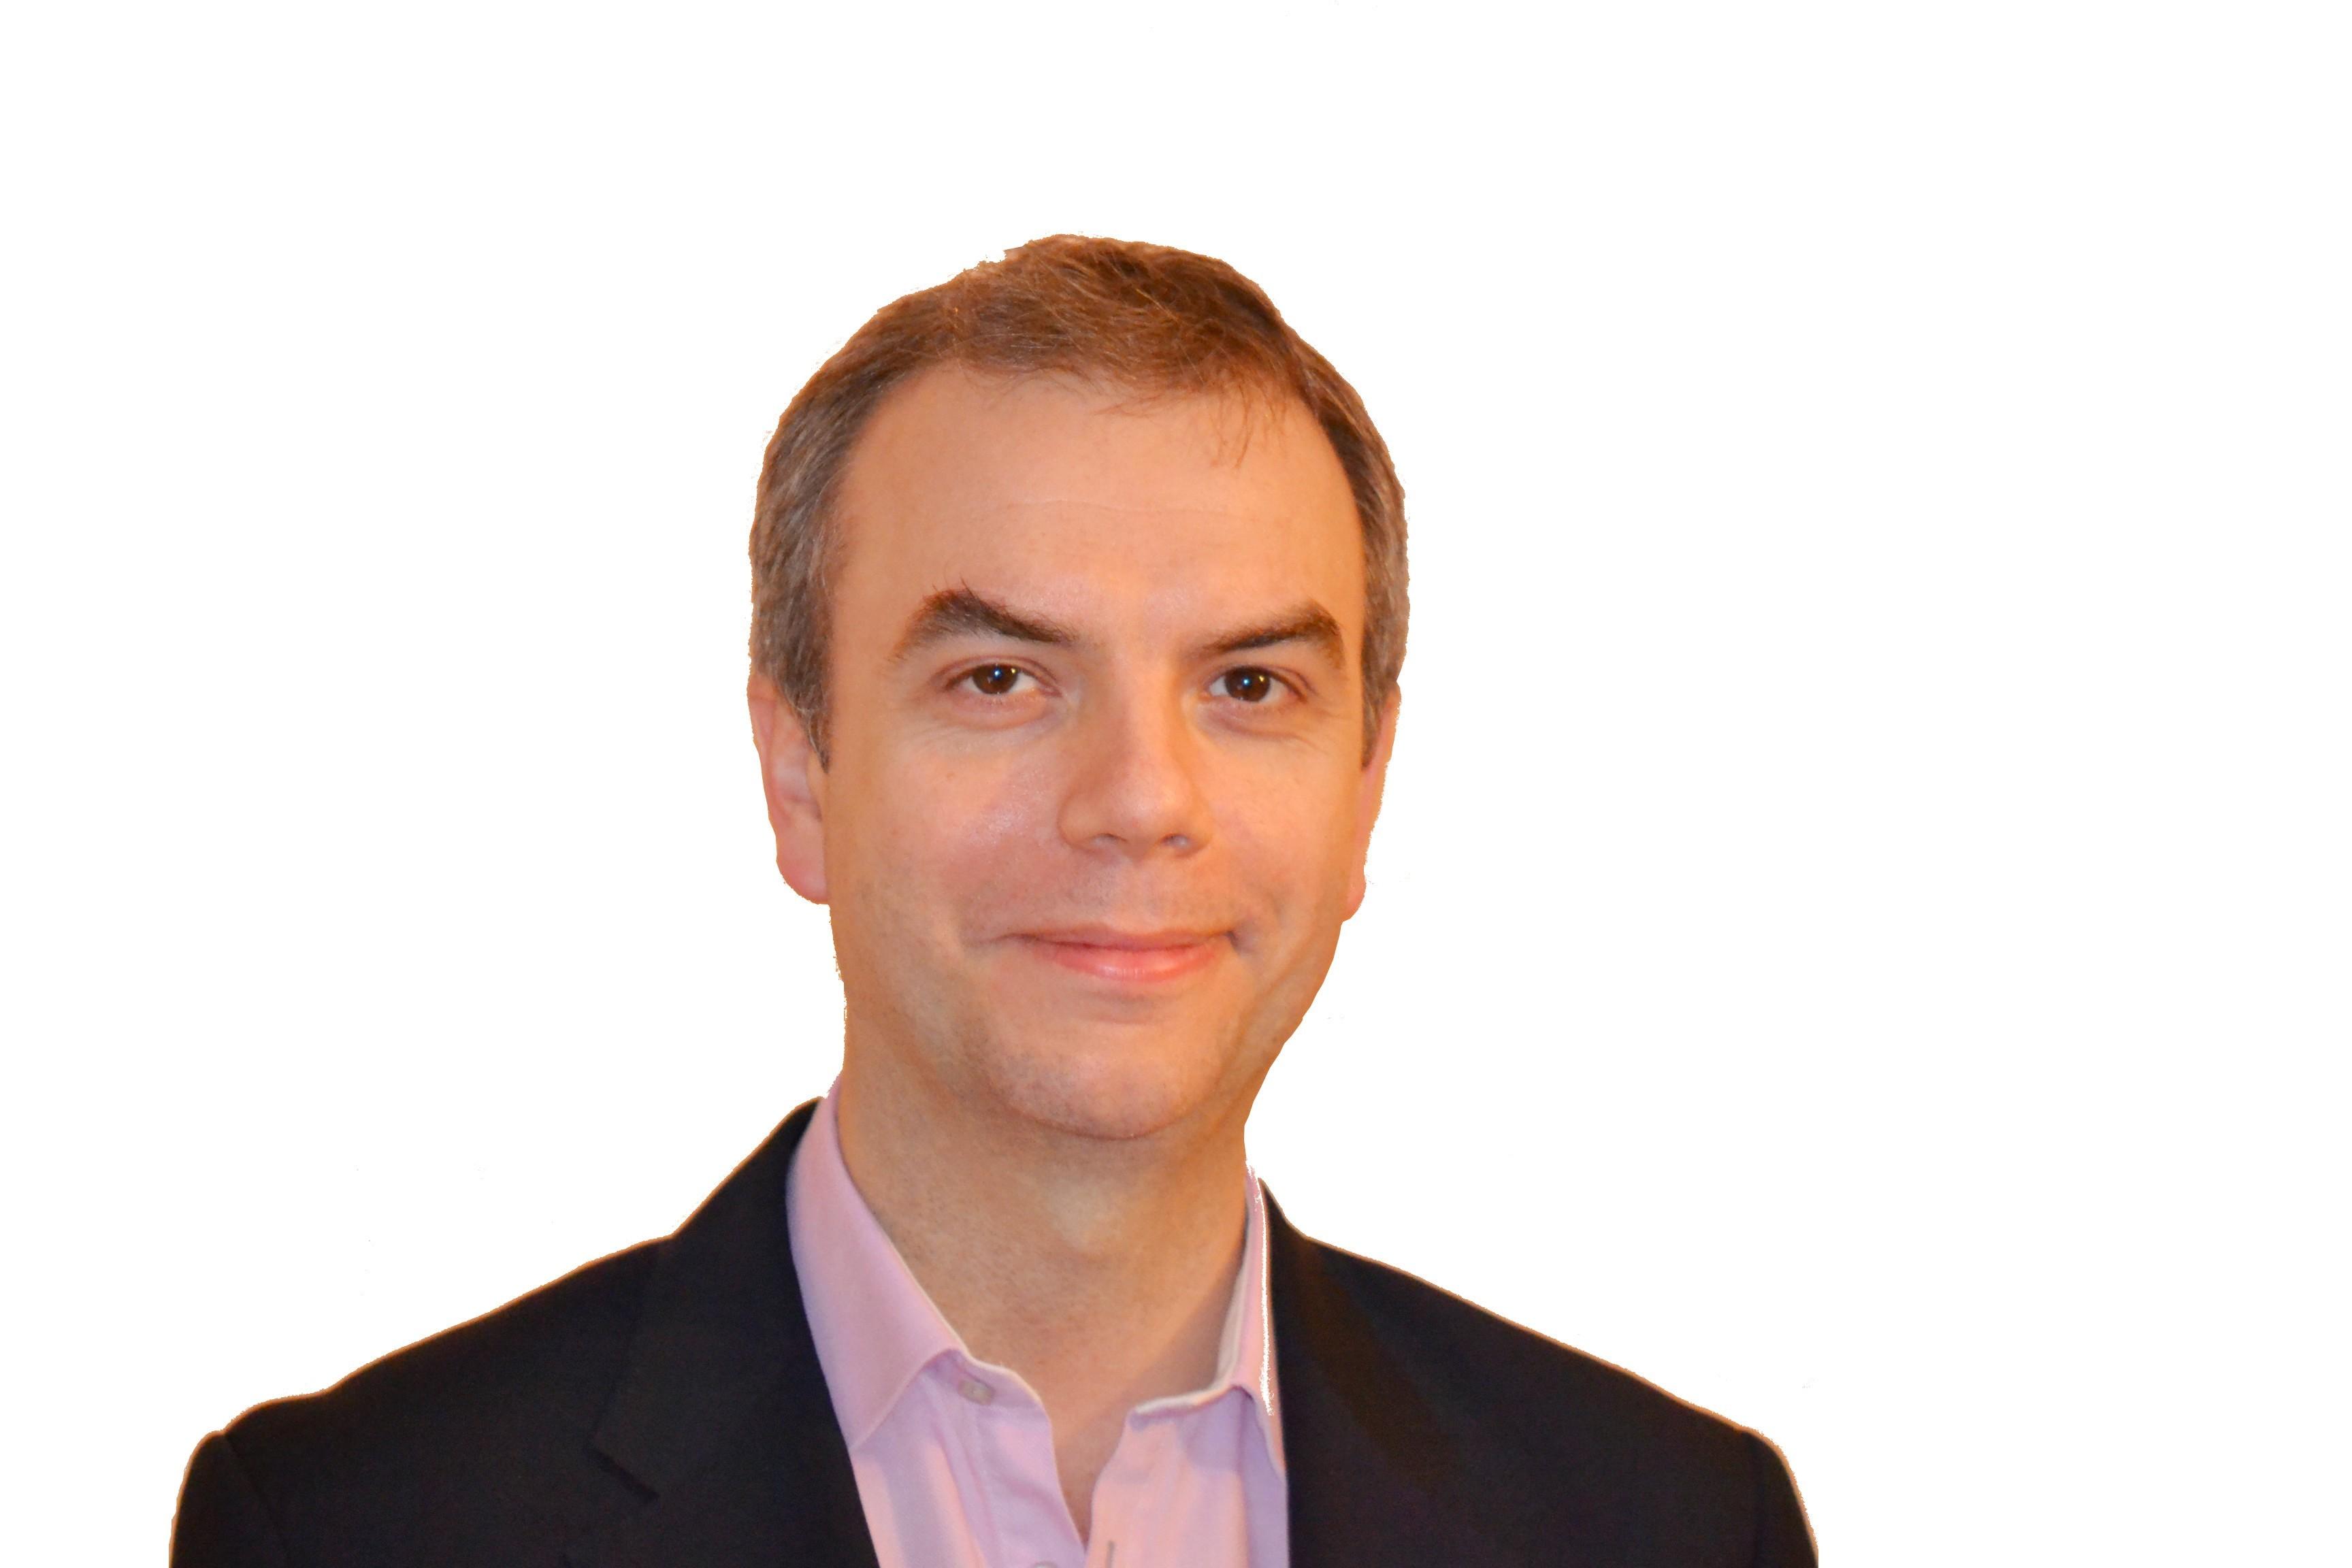 Raphaël Vergnaud Anatole - VP Marketing and Sales (Photo: Business Wire)